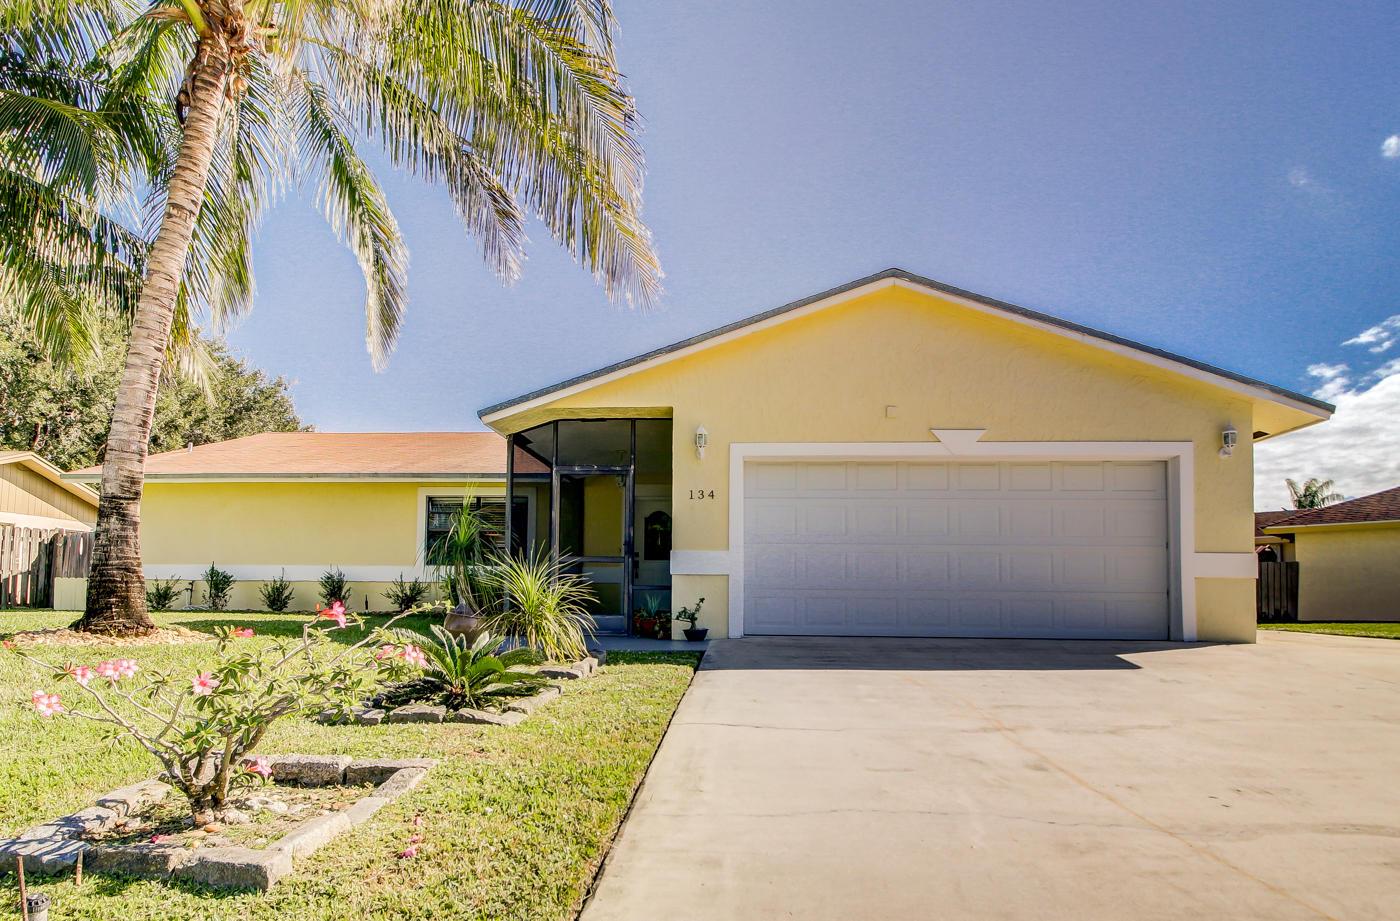 134 Santa Monica Avenue - Royal Palm Beach, Florida